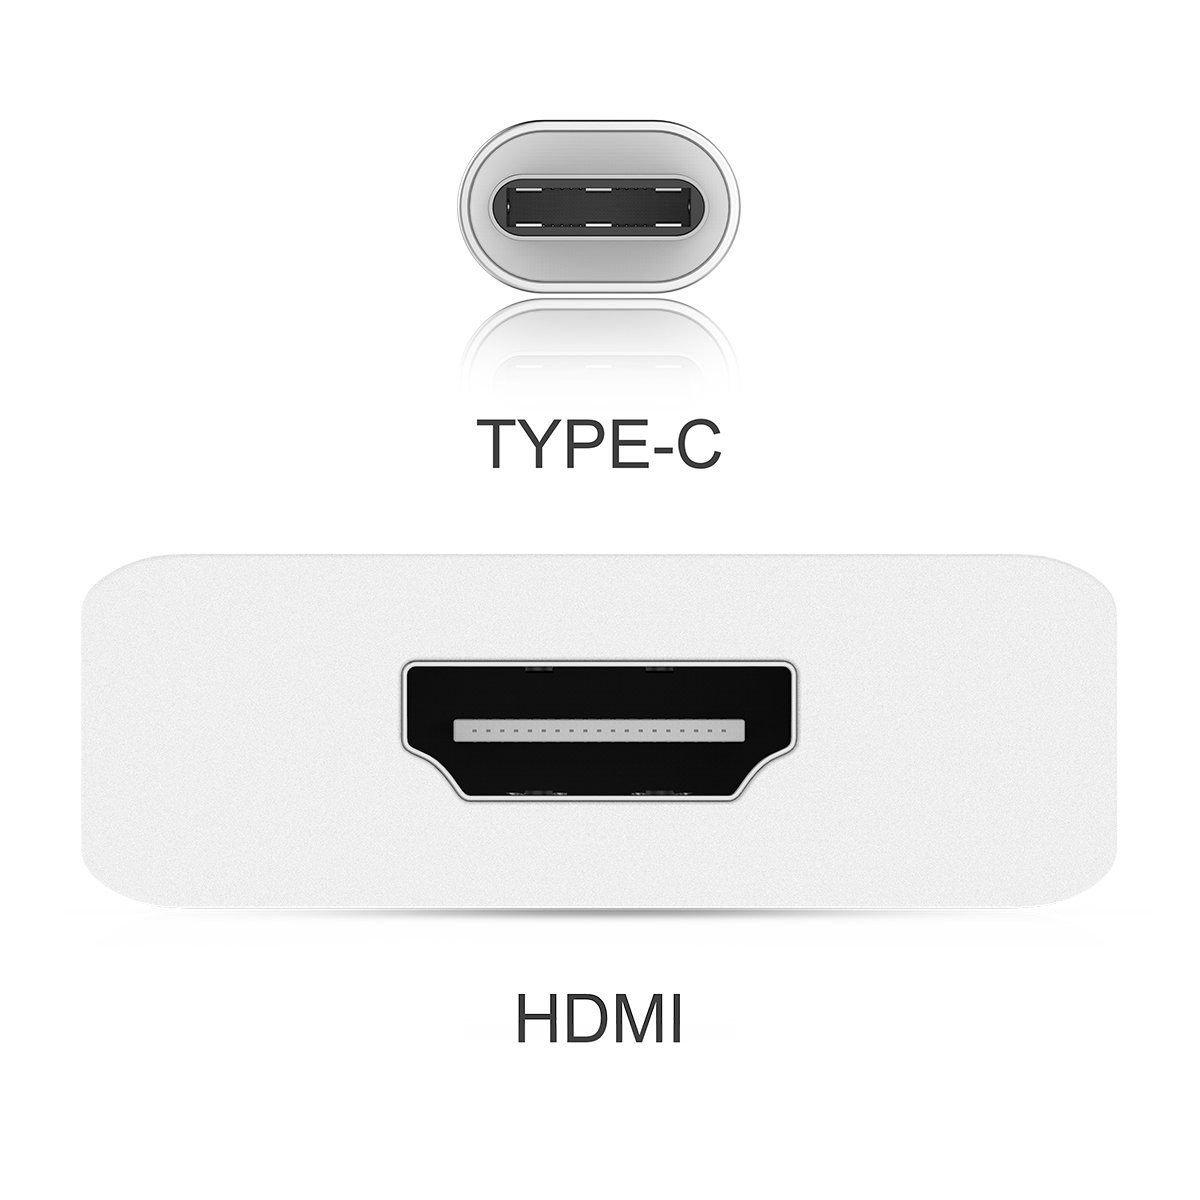 Compatible con Thunderbolt 3 Adaptador USB 2.0 Kimwood Tipo C a HDMI 4K CUHAWUDBA Adaptador USB C a HDMI para Galaxy S8 // S8 Plus//Note 8 Macbook Macbook Pro iMac Chromebook Pixel DELL XPS 15